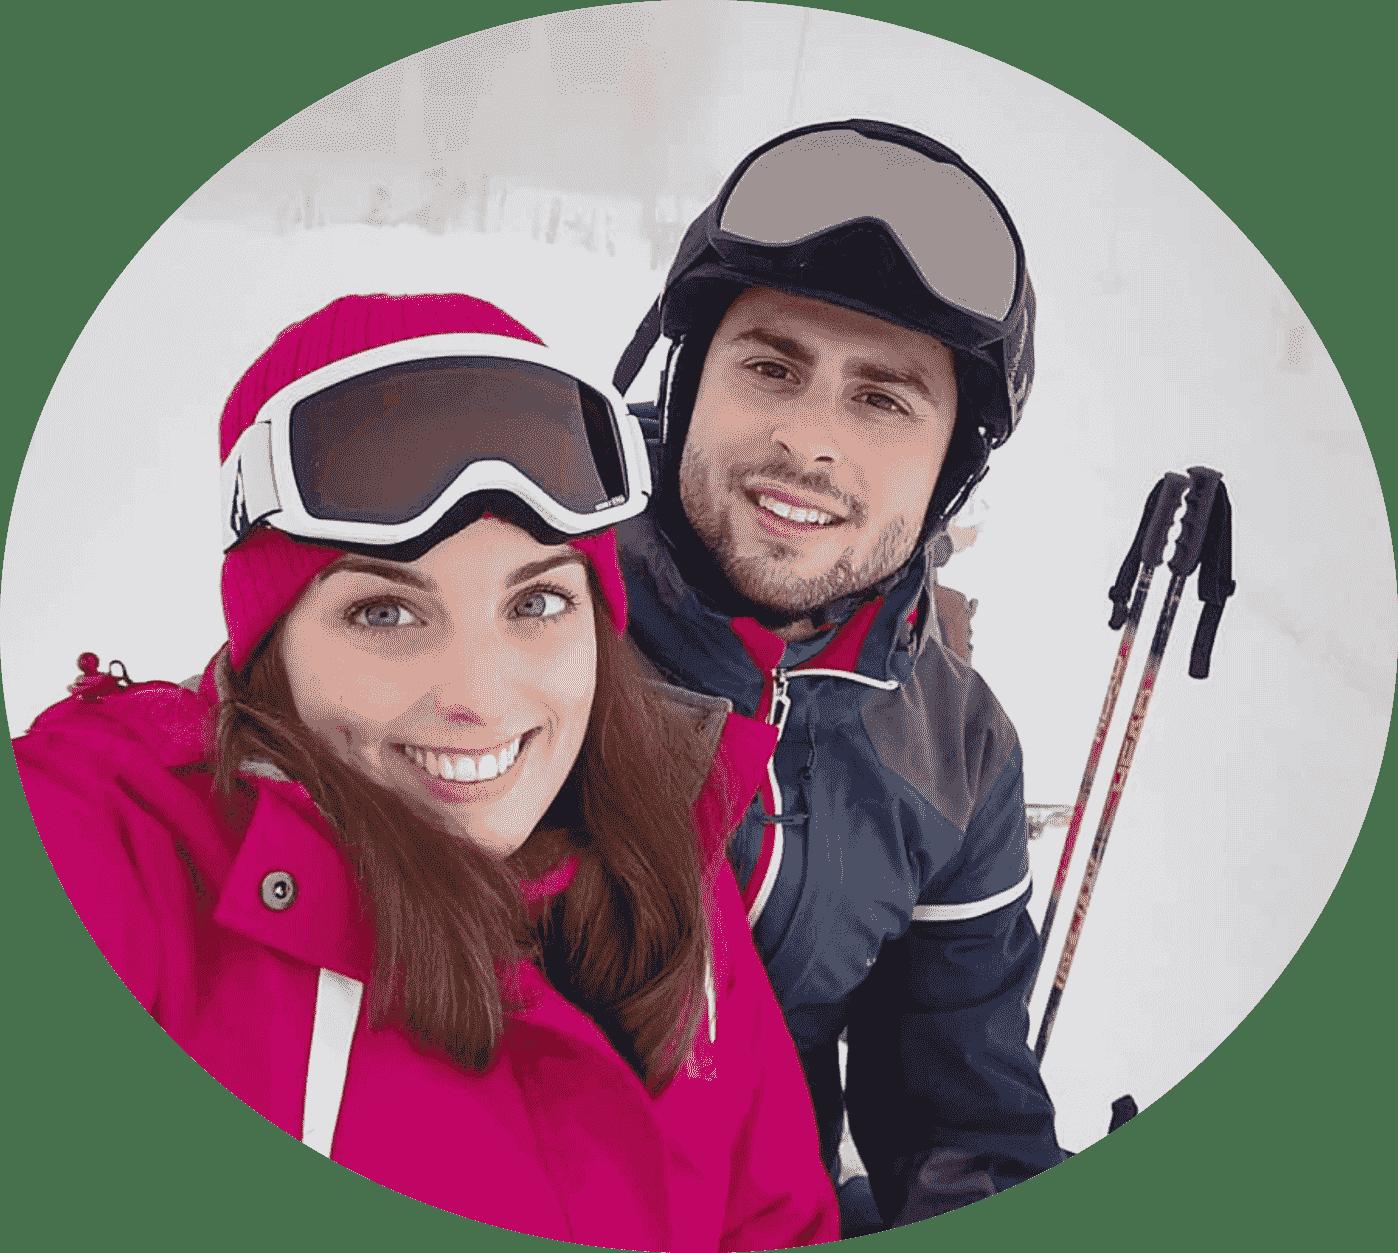 Couple My-Mountains Switzerland Ski Lessons